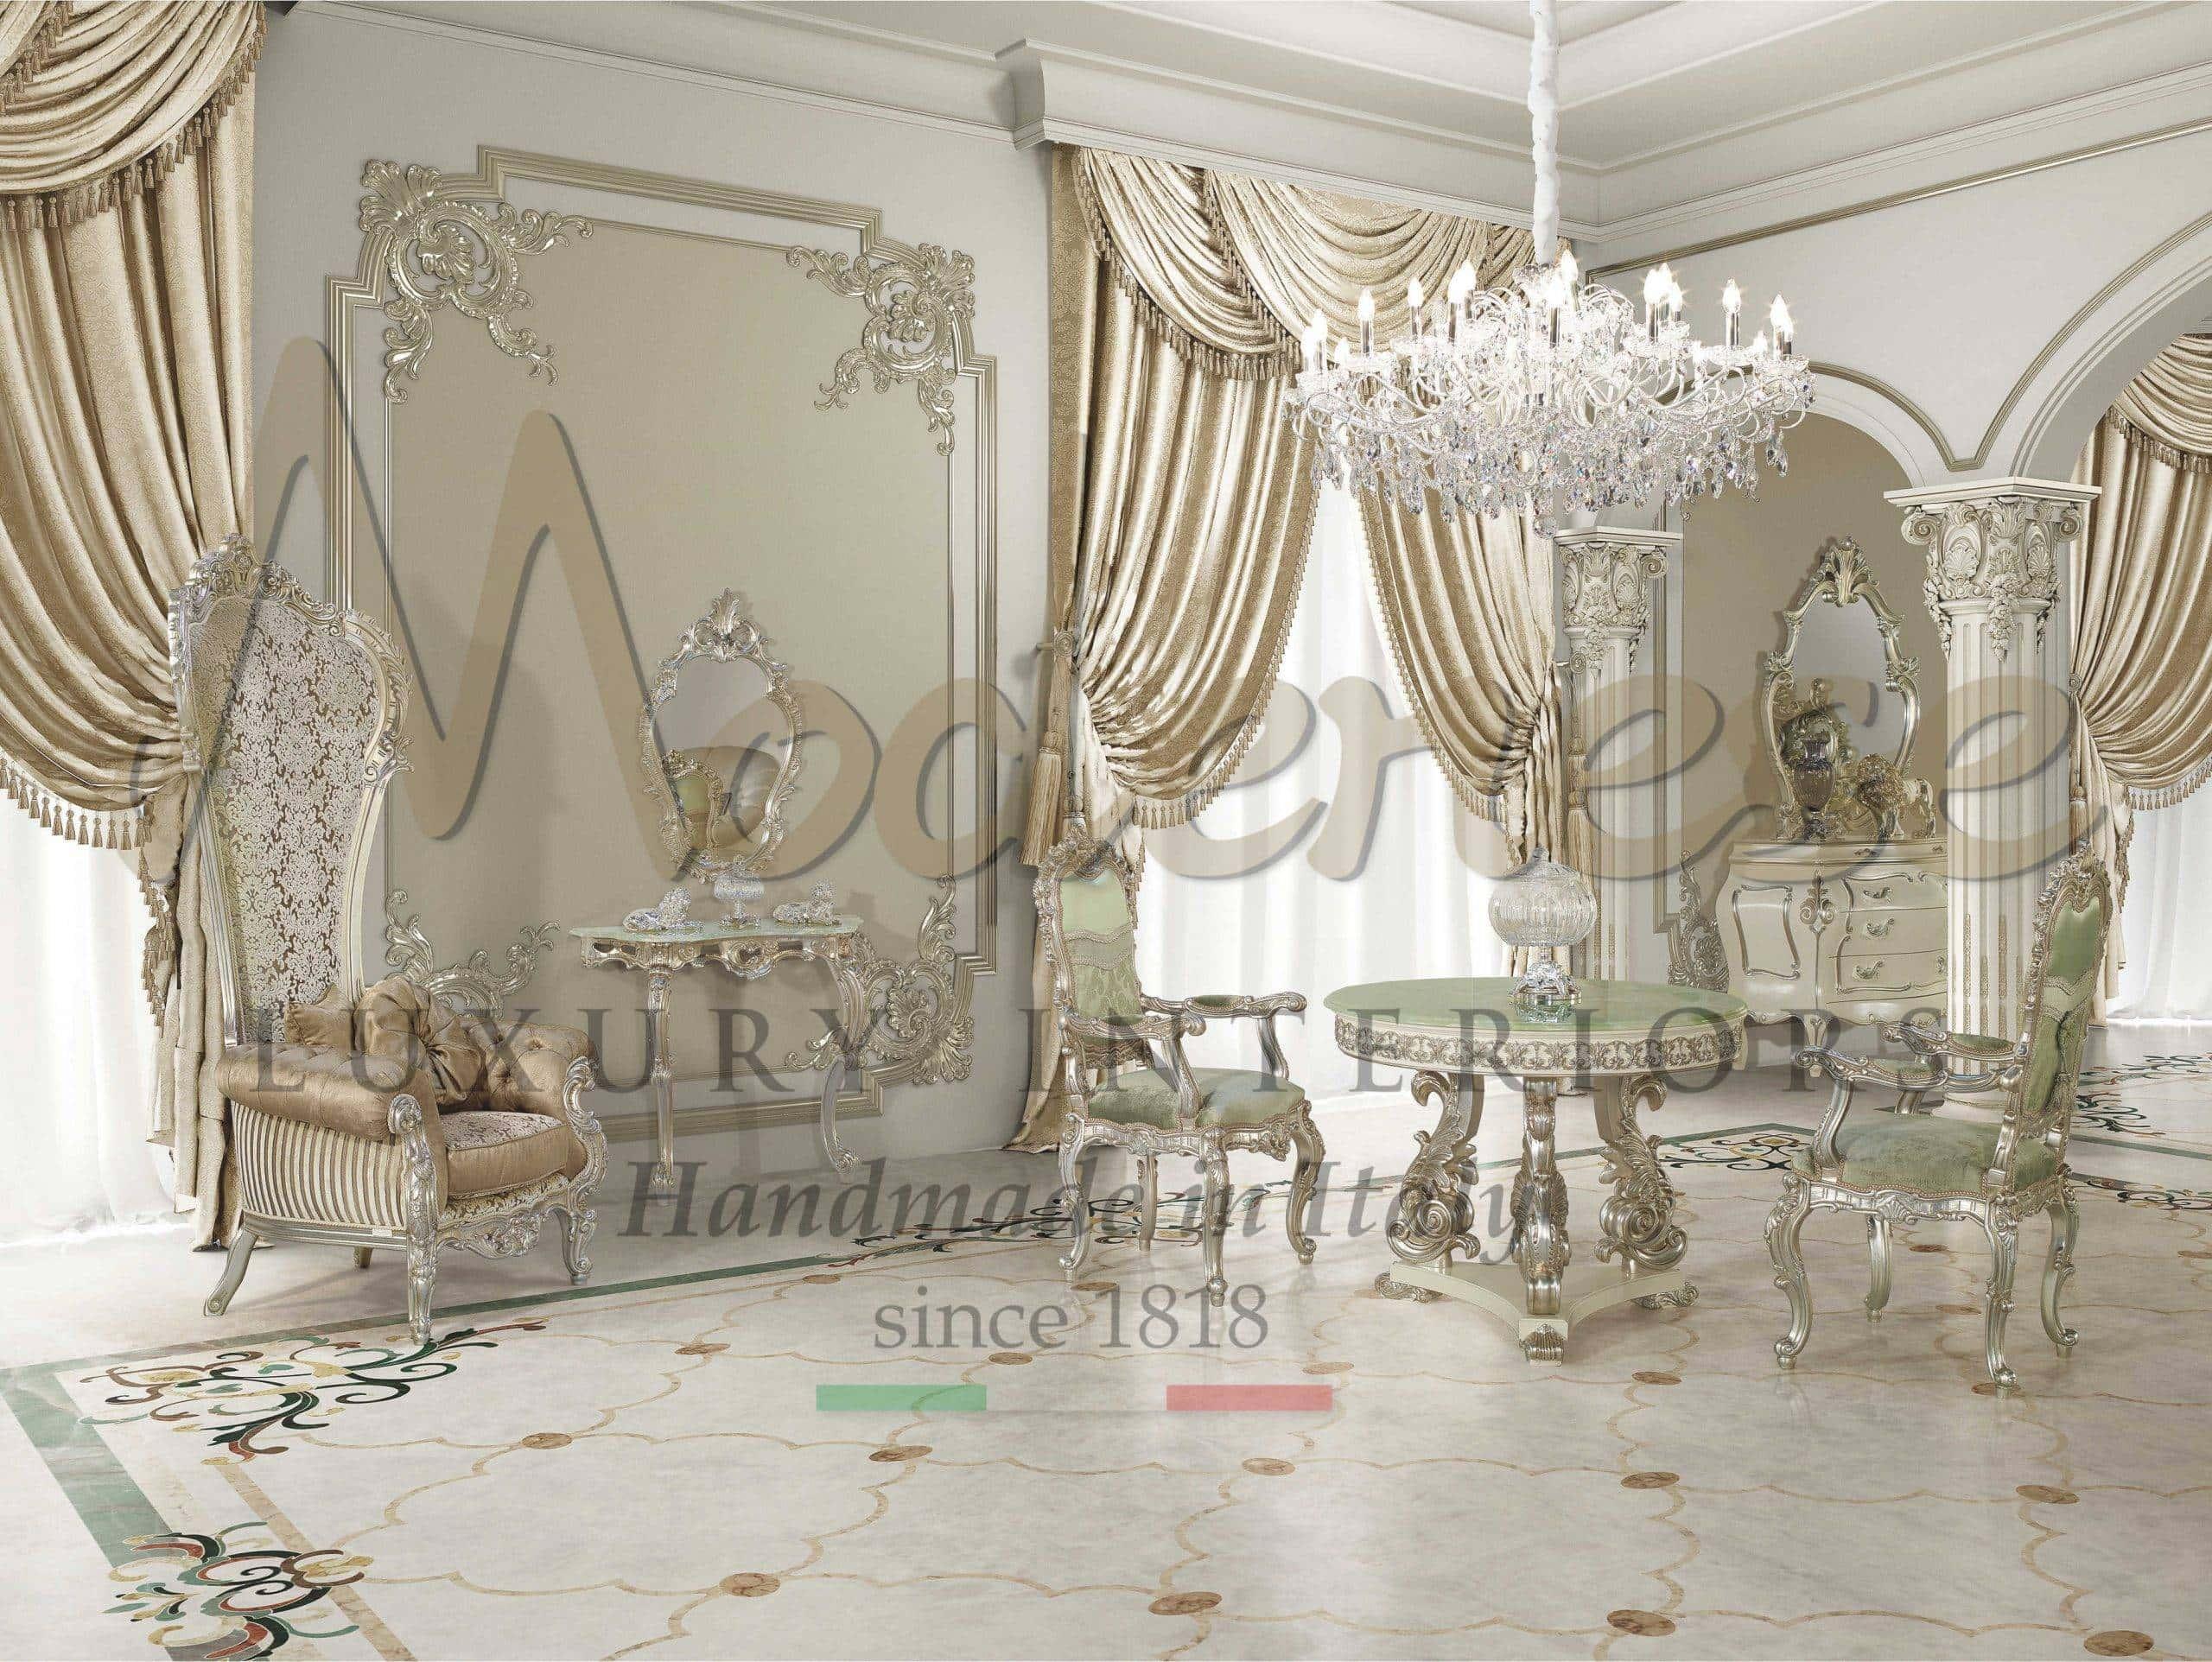 Classic Luxury Living Room Furniture Italian Artisanal Handmade Furniture High End Italian Home Decor Furnishing Modenese